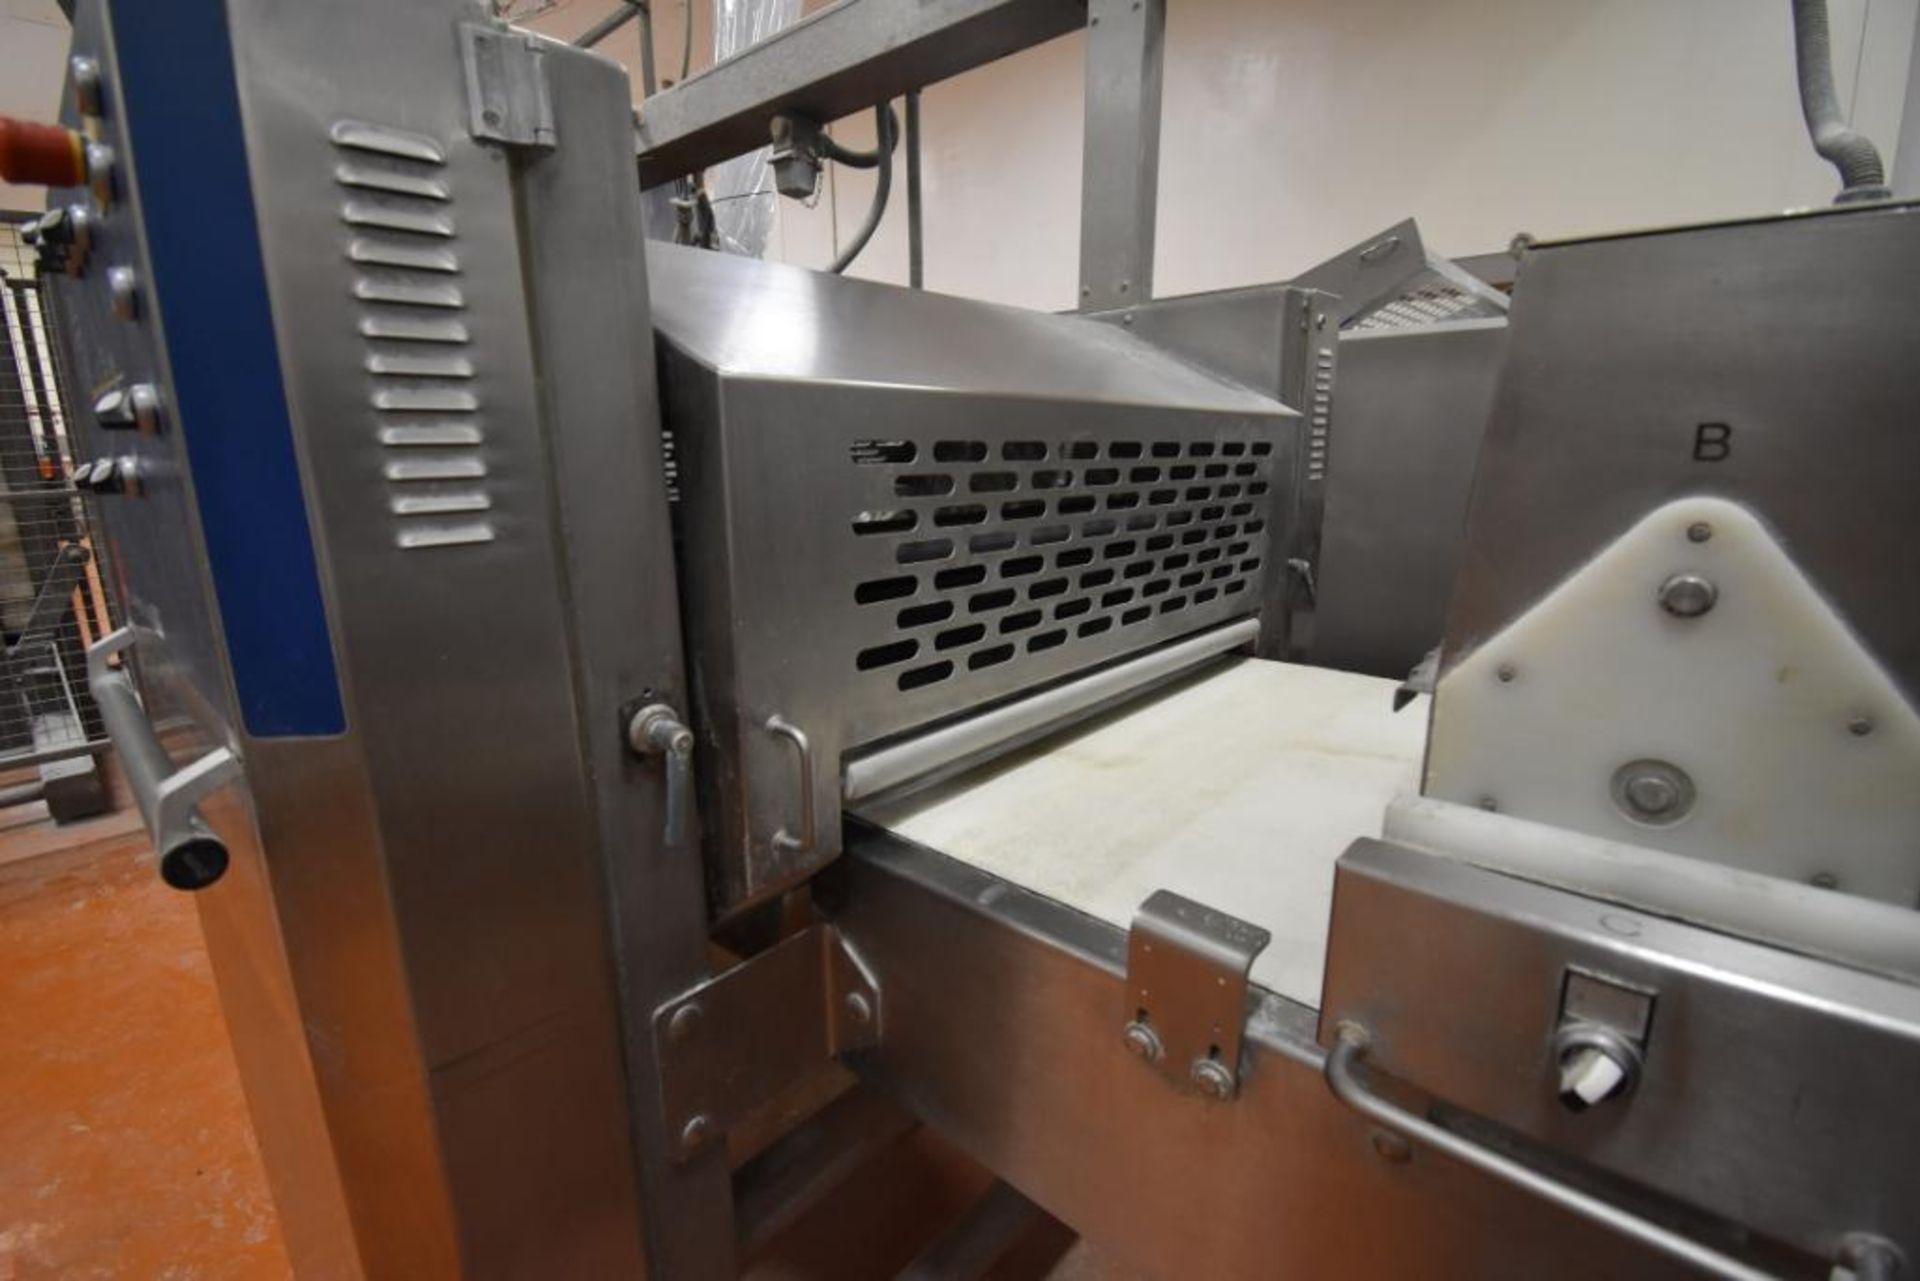 2007 Fritsch Laminator 3000 dough line - Image 65 of 280